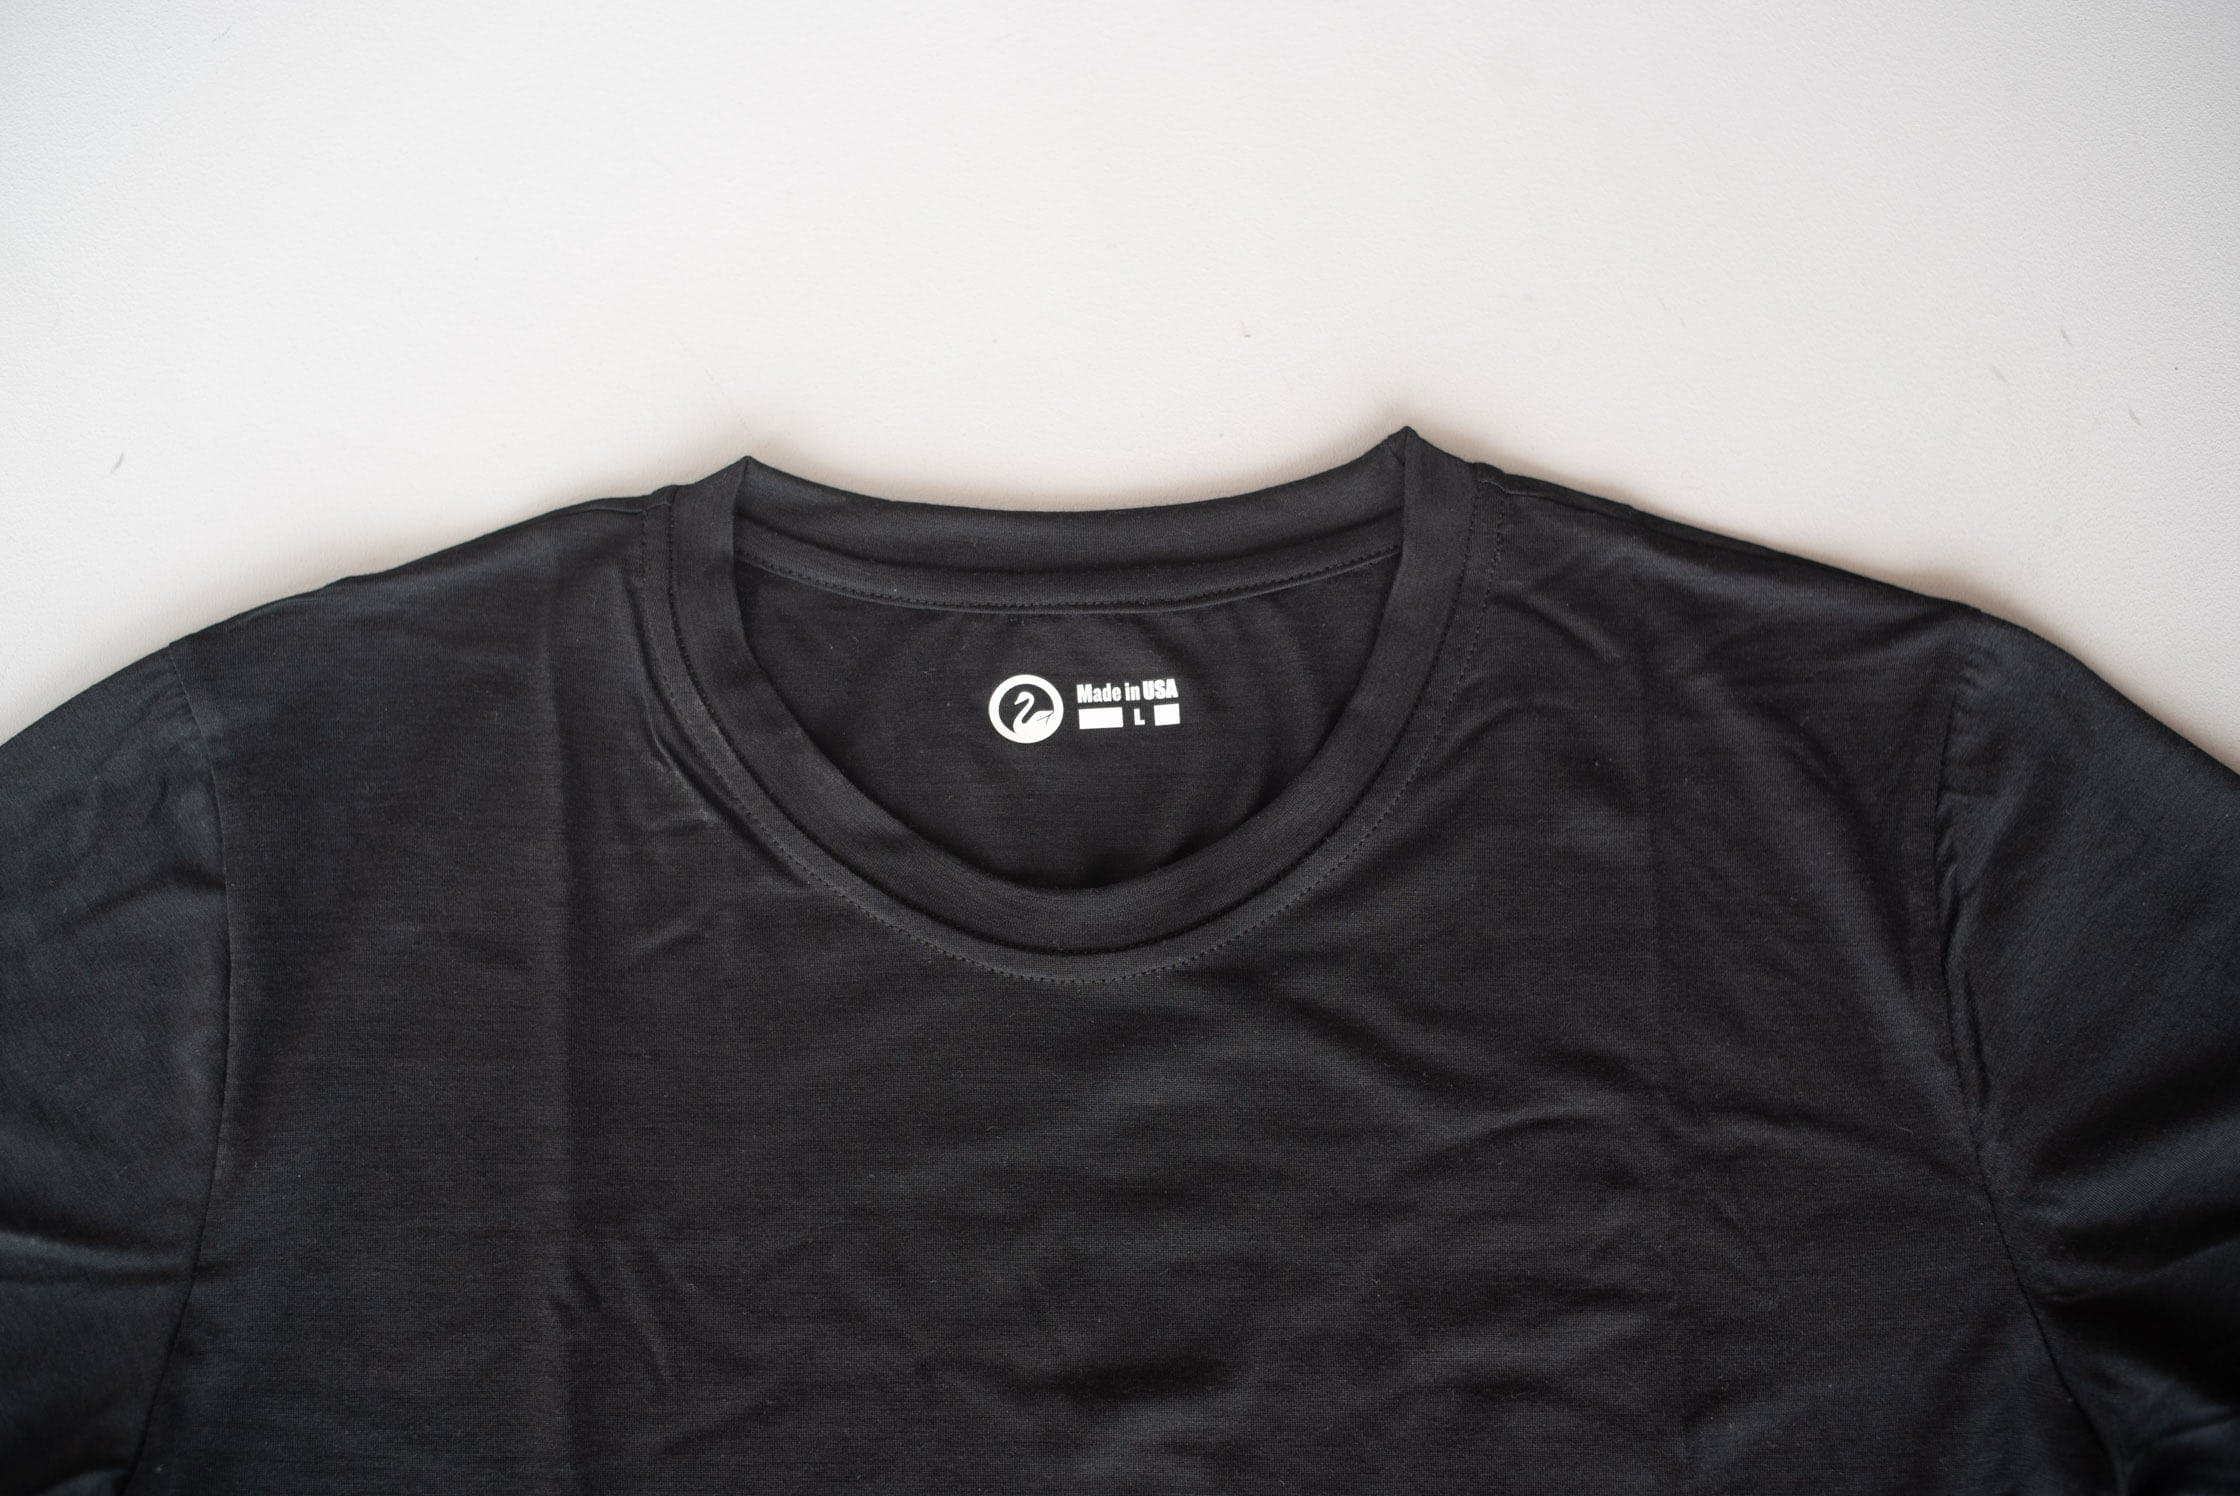 Outlier Runweight Merino Black T-shirt Neckline